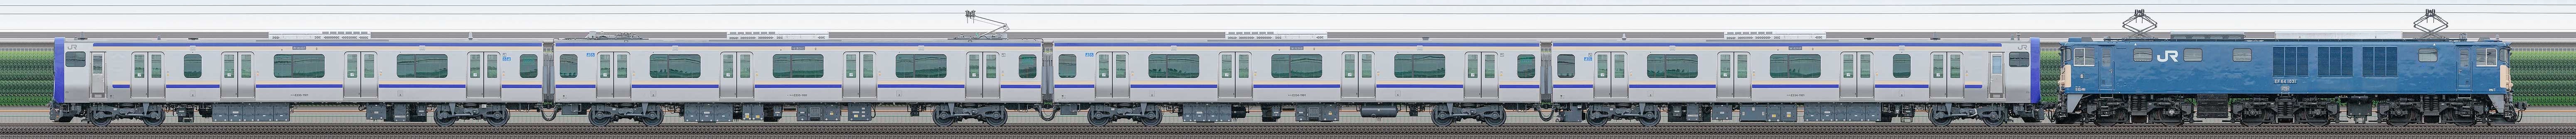 JR東日本 横須賀線・総武快速線 E235系1000番台J-01編成配給輸送(山側)の編成サイドビュー